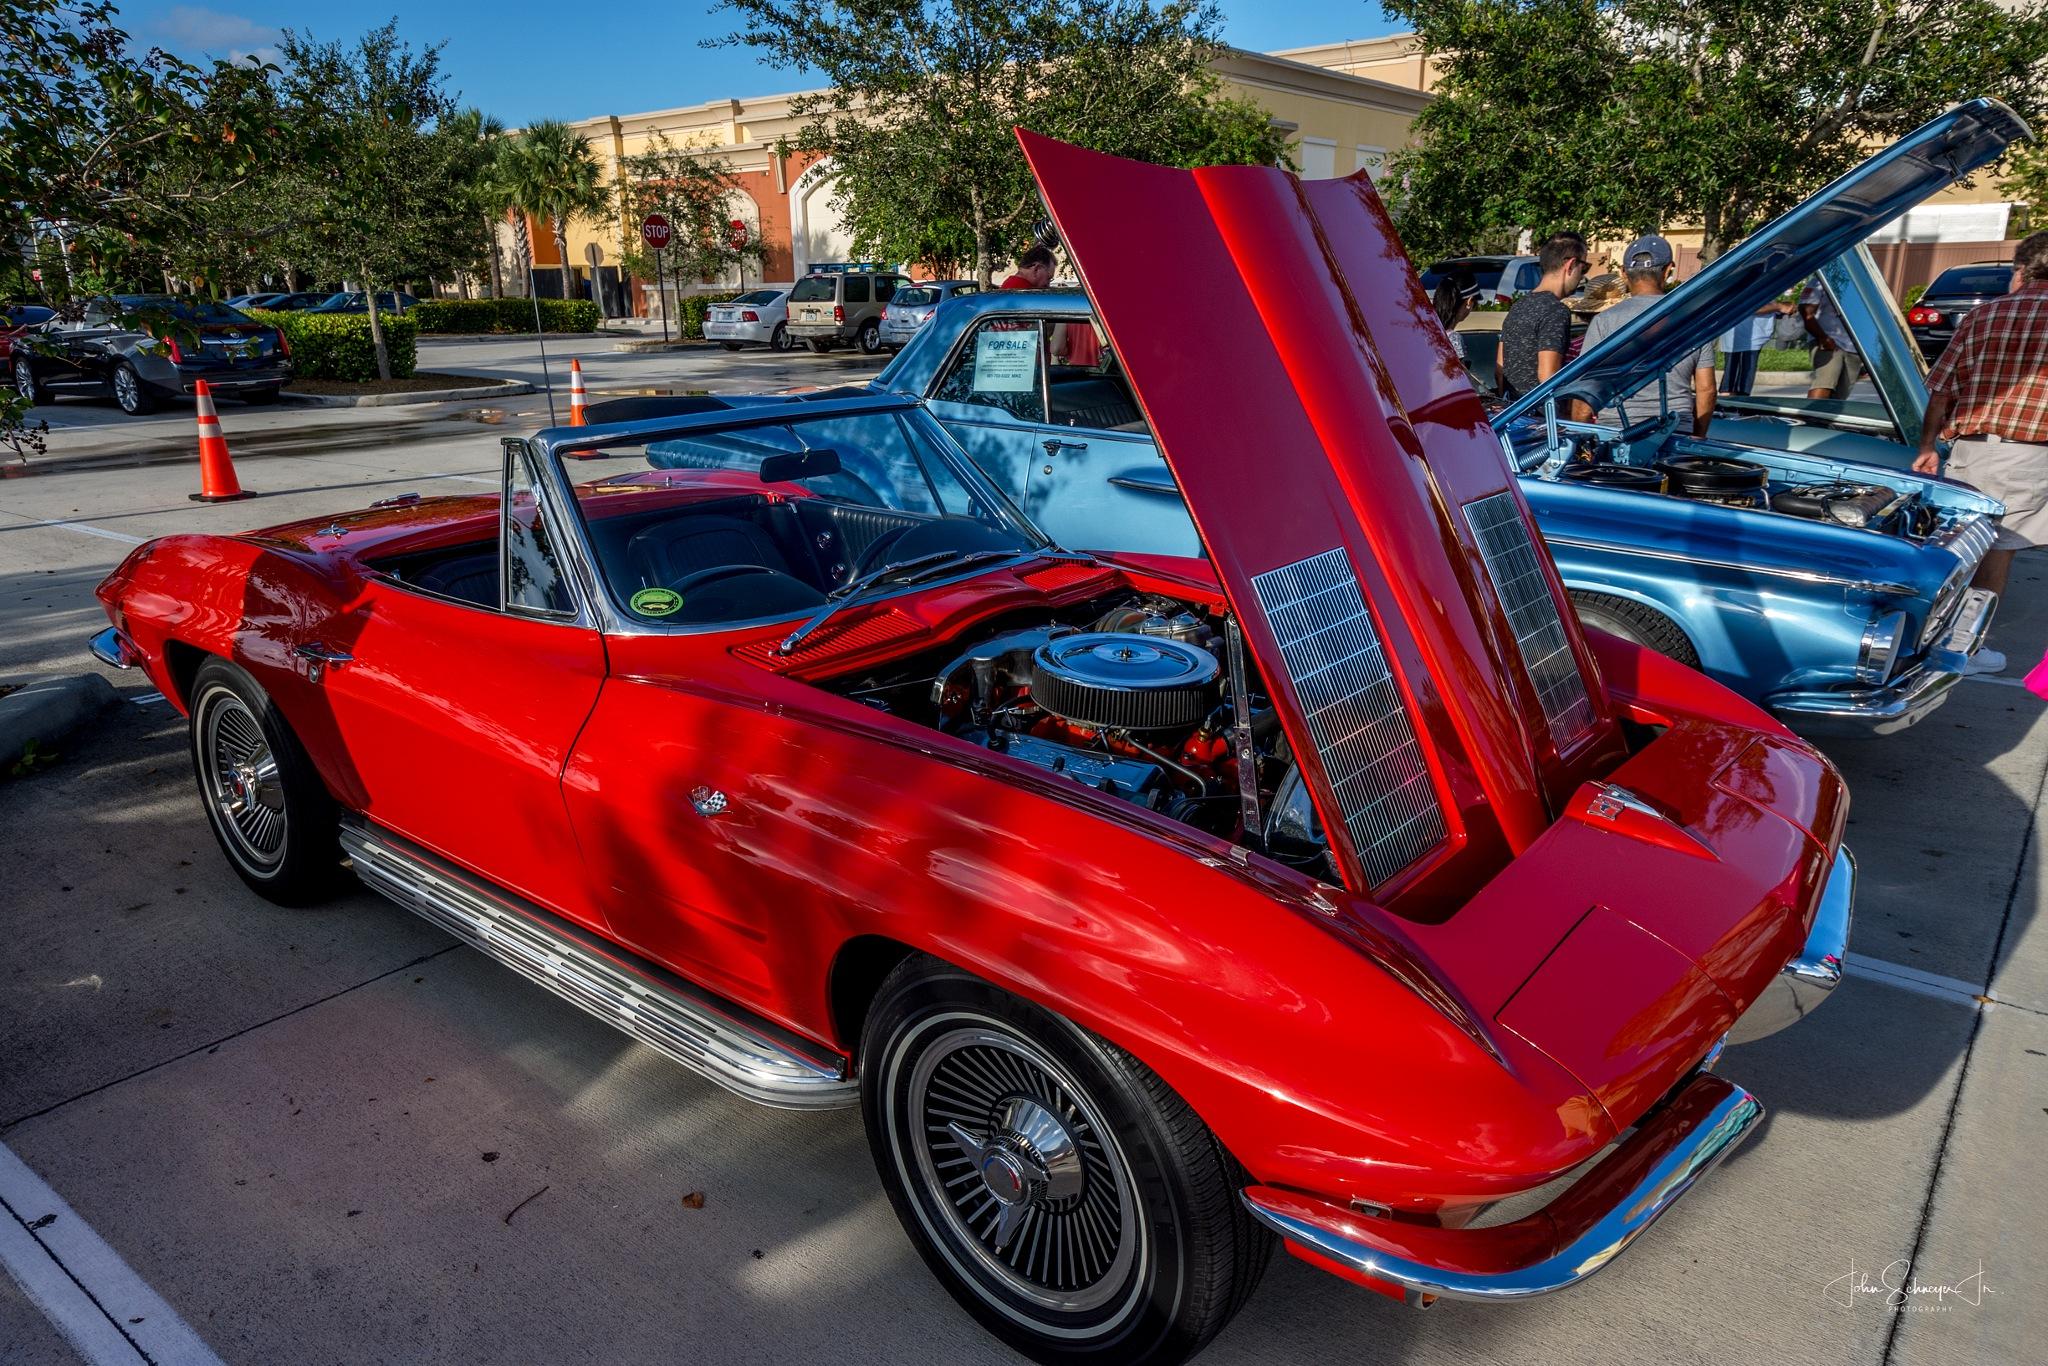 Sweet Red Corvette by John Schneyer